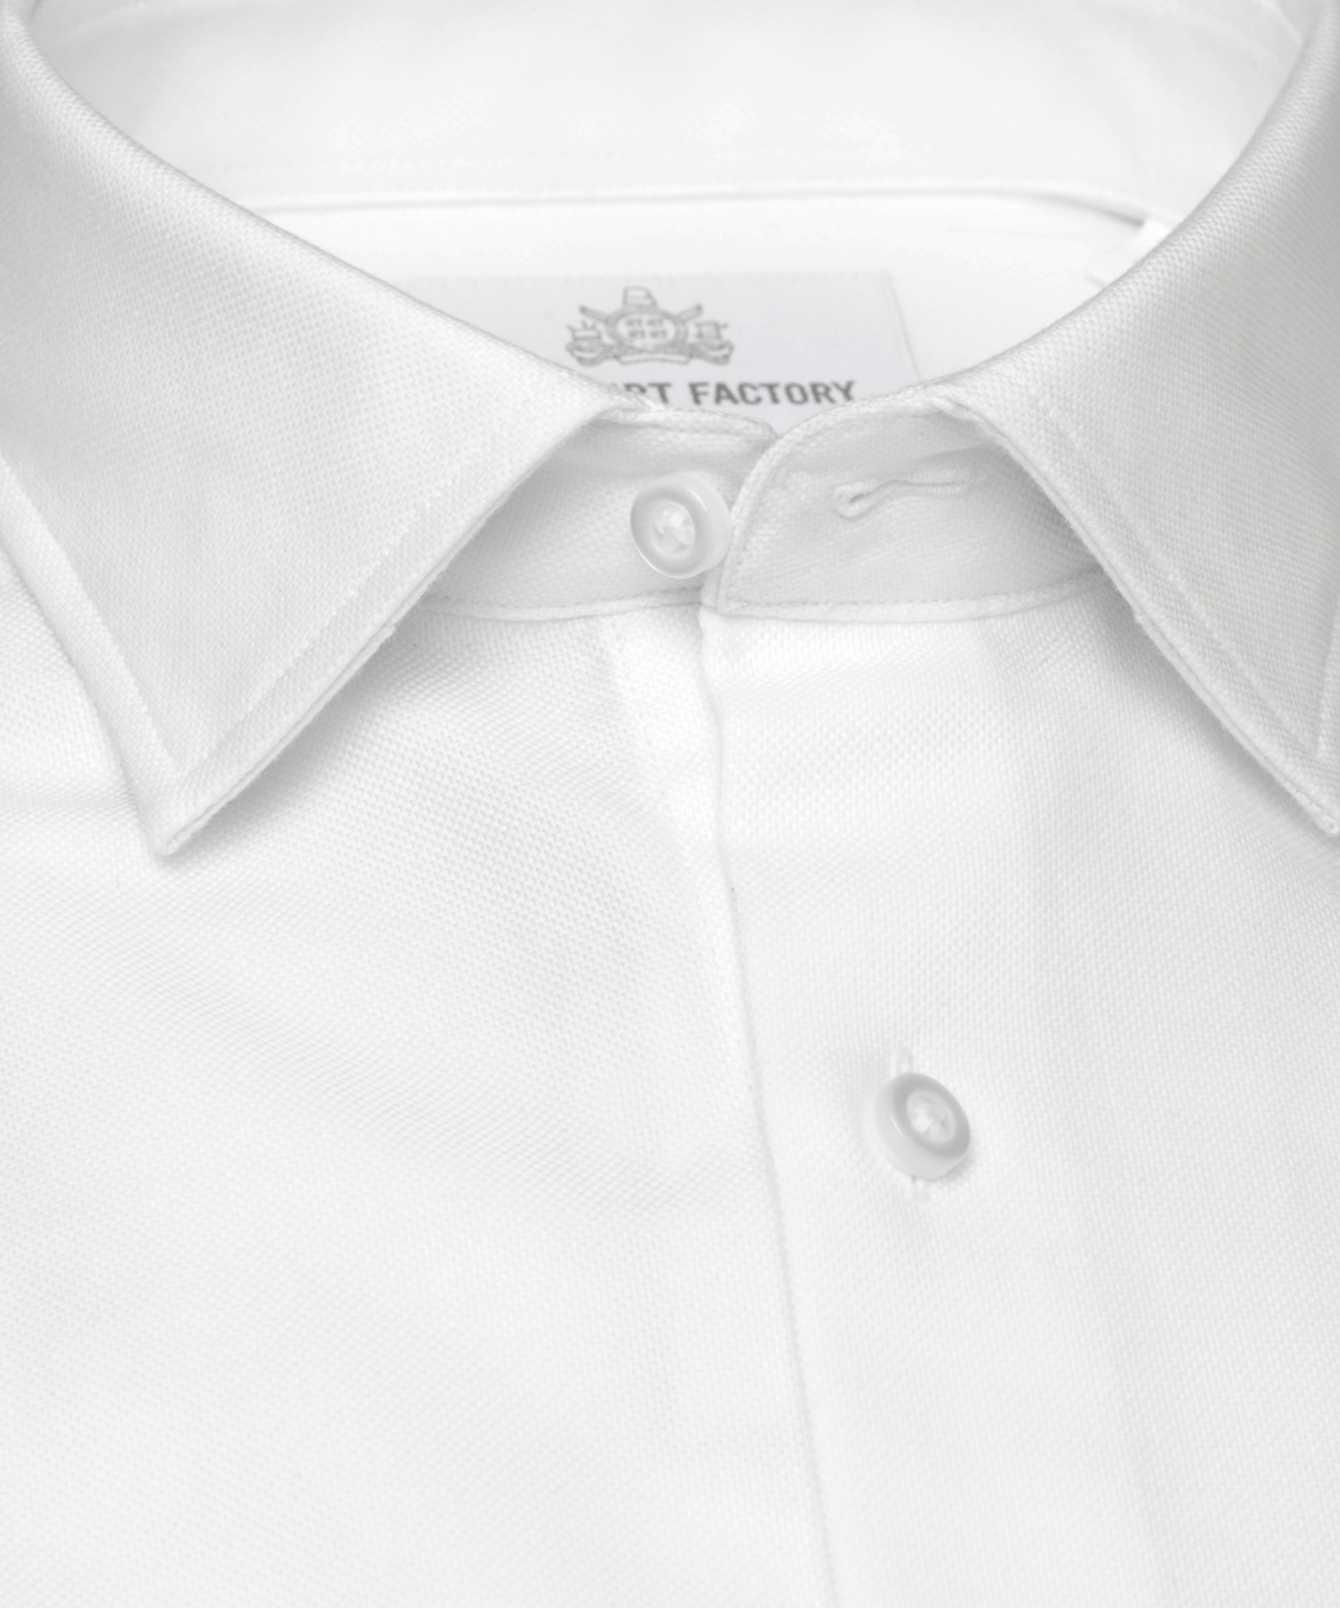 Shirt Stanton The Shirt Factory